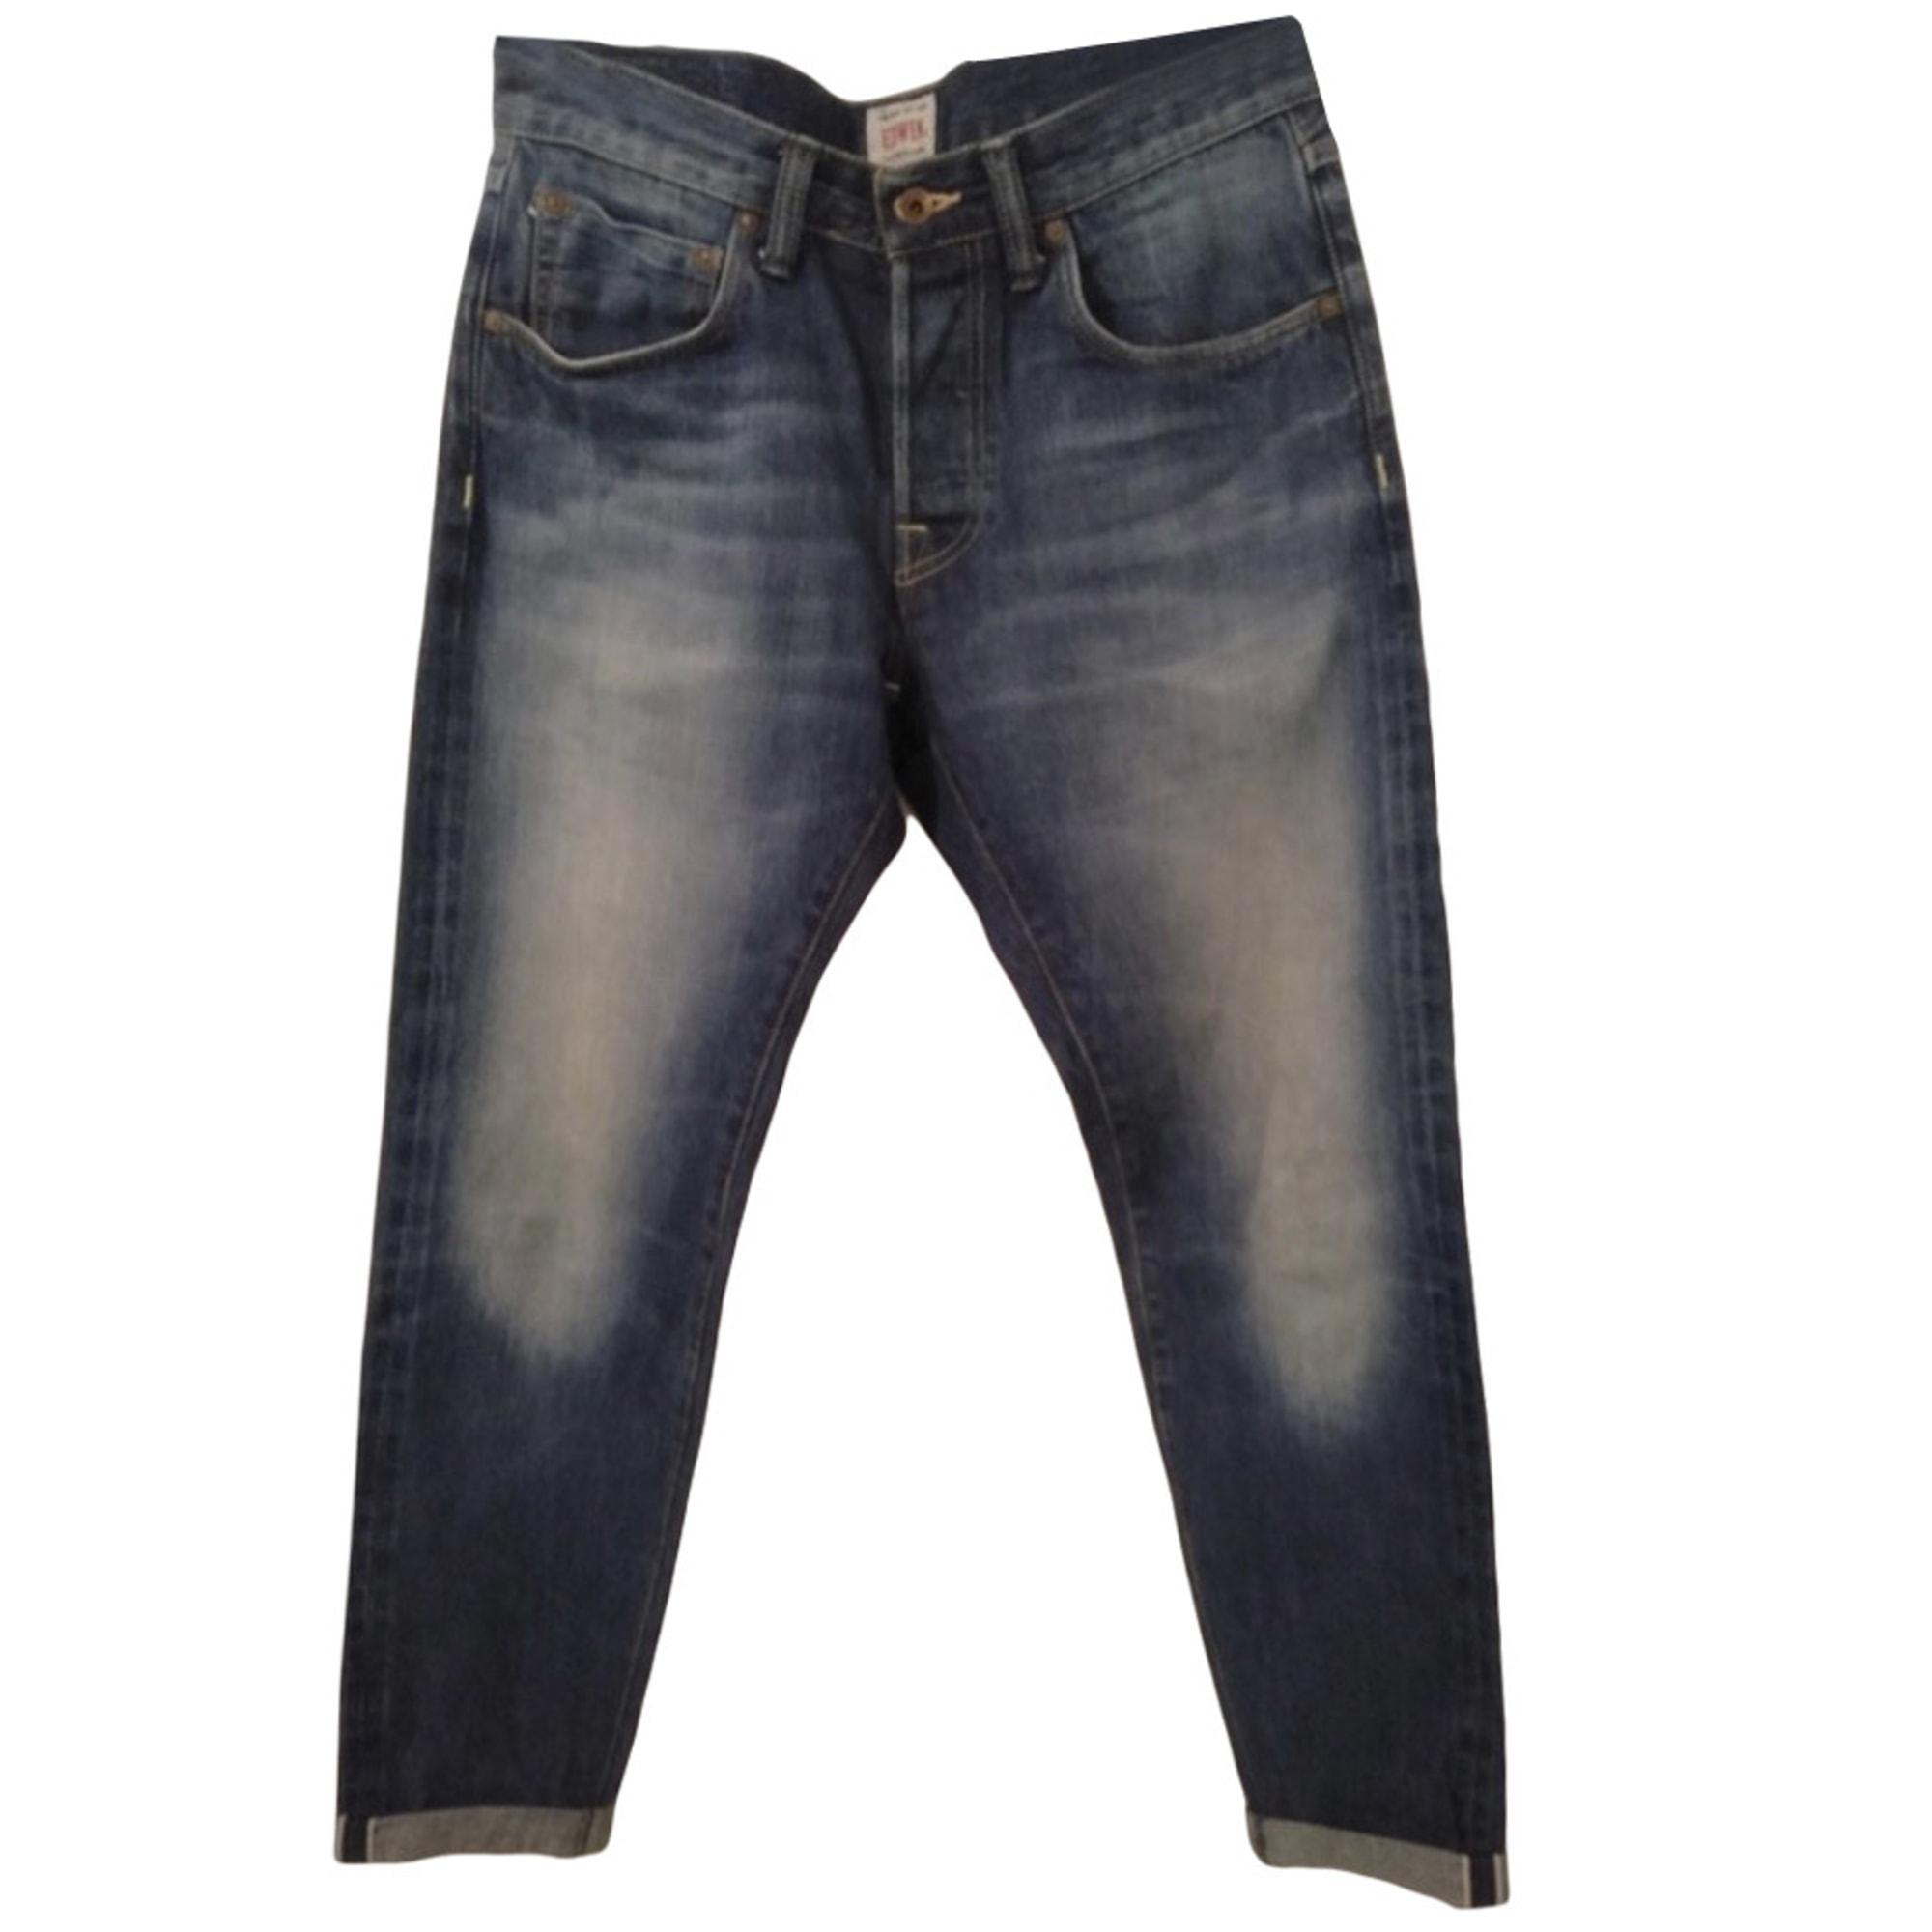 Straight Leg Jeans EDWIN Blue, navy, turquoise